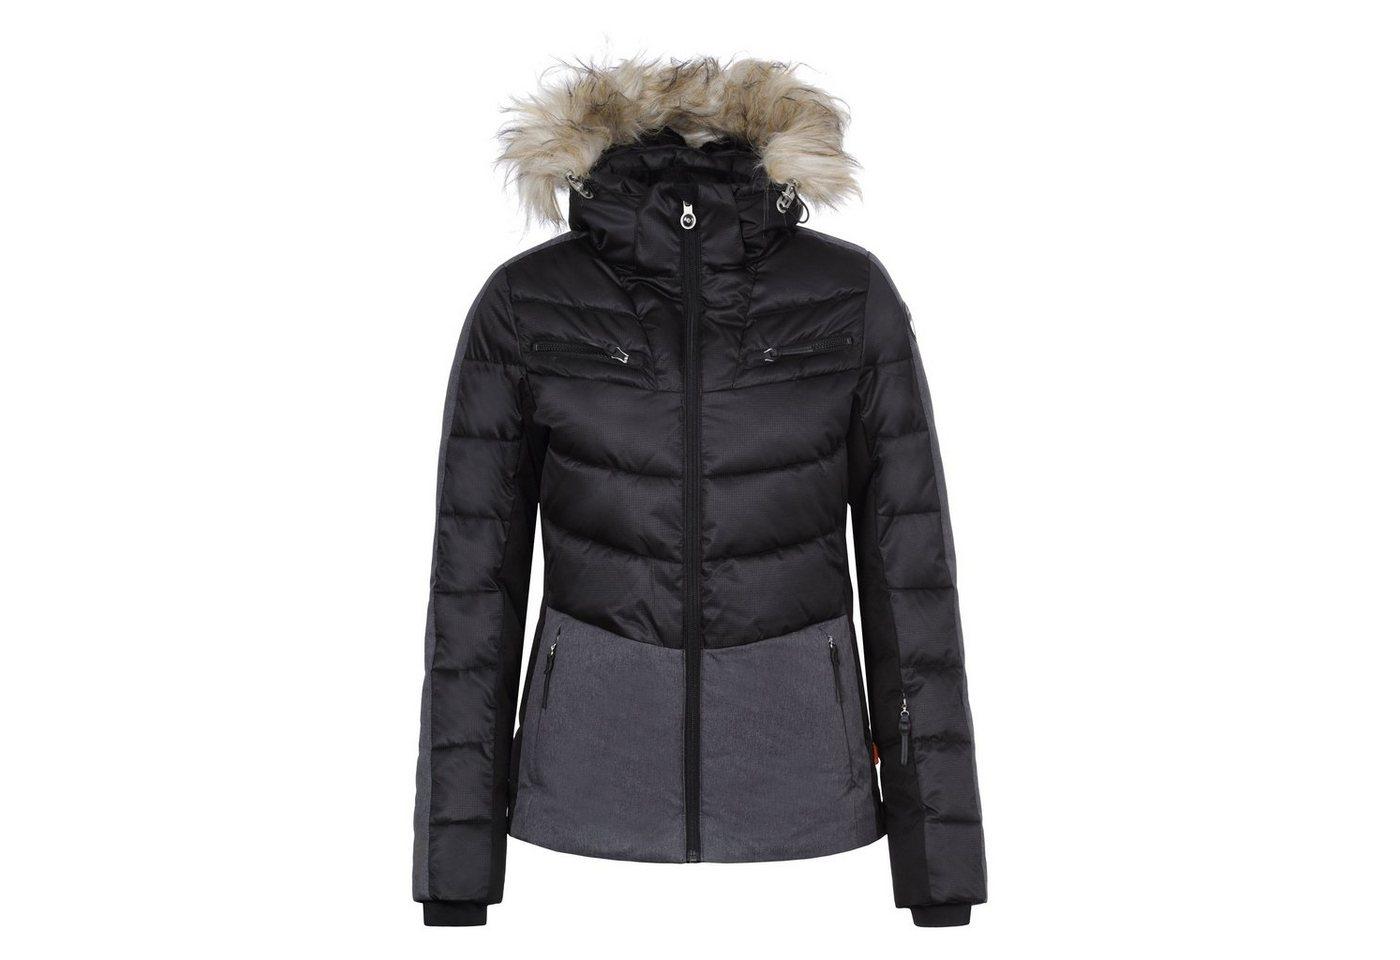 Icepeak Skijacke »Cathy 53205-635« | Sportbekleidung > Sportjacken > Skijacken | Schwarz | Lycra | Icepeak